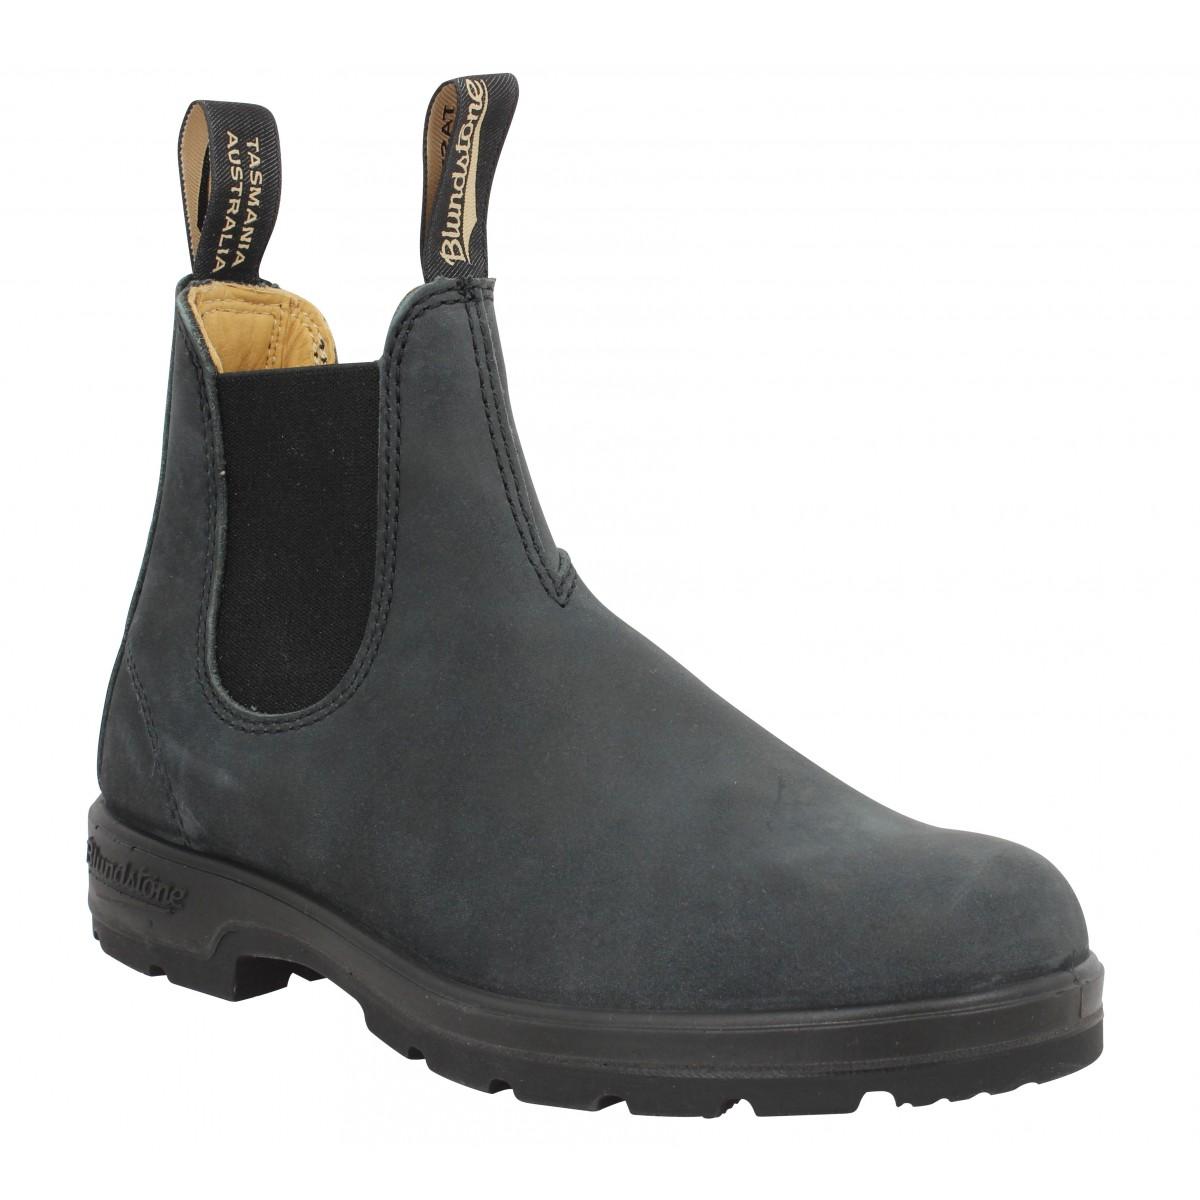 Bottines BLUNDSTONE Boots Comfort 587 cuir Femme Noir